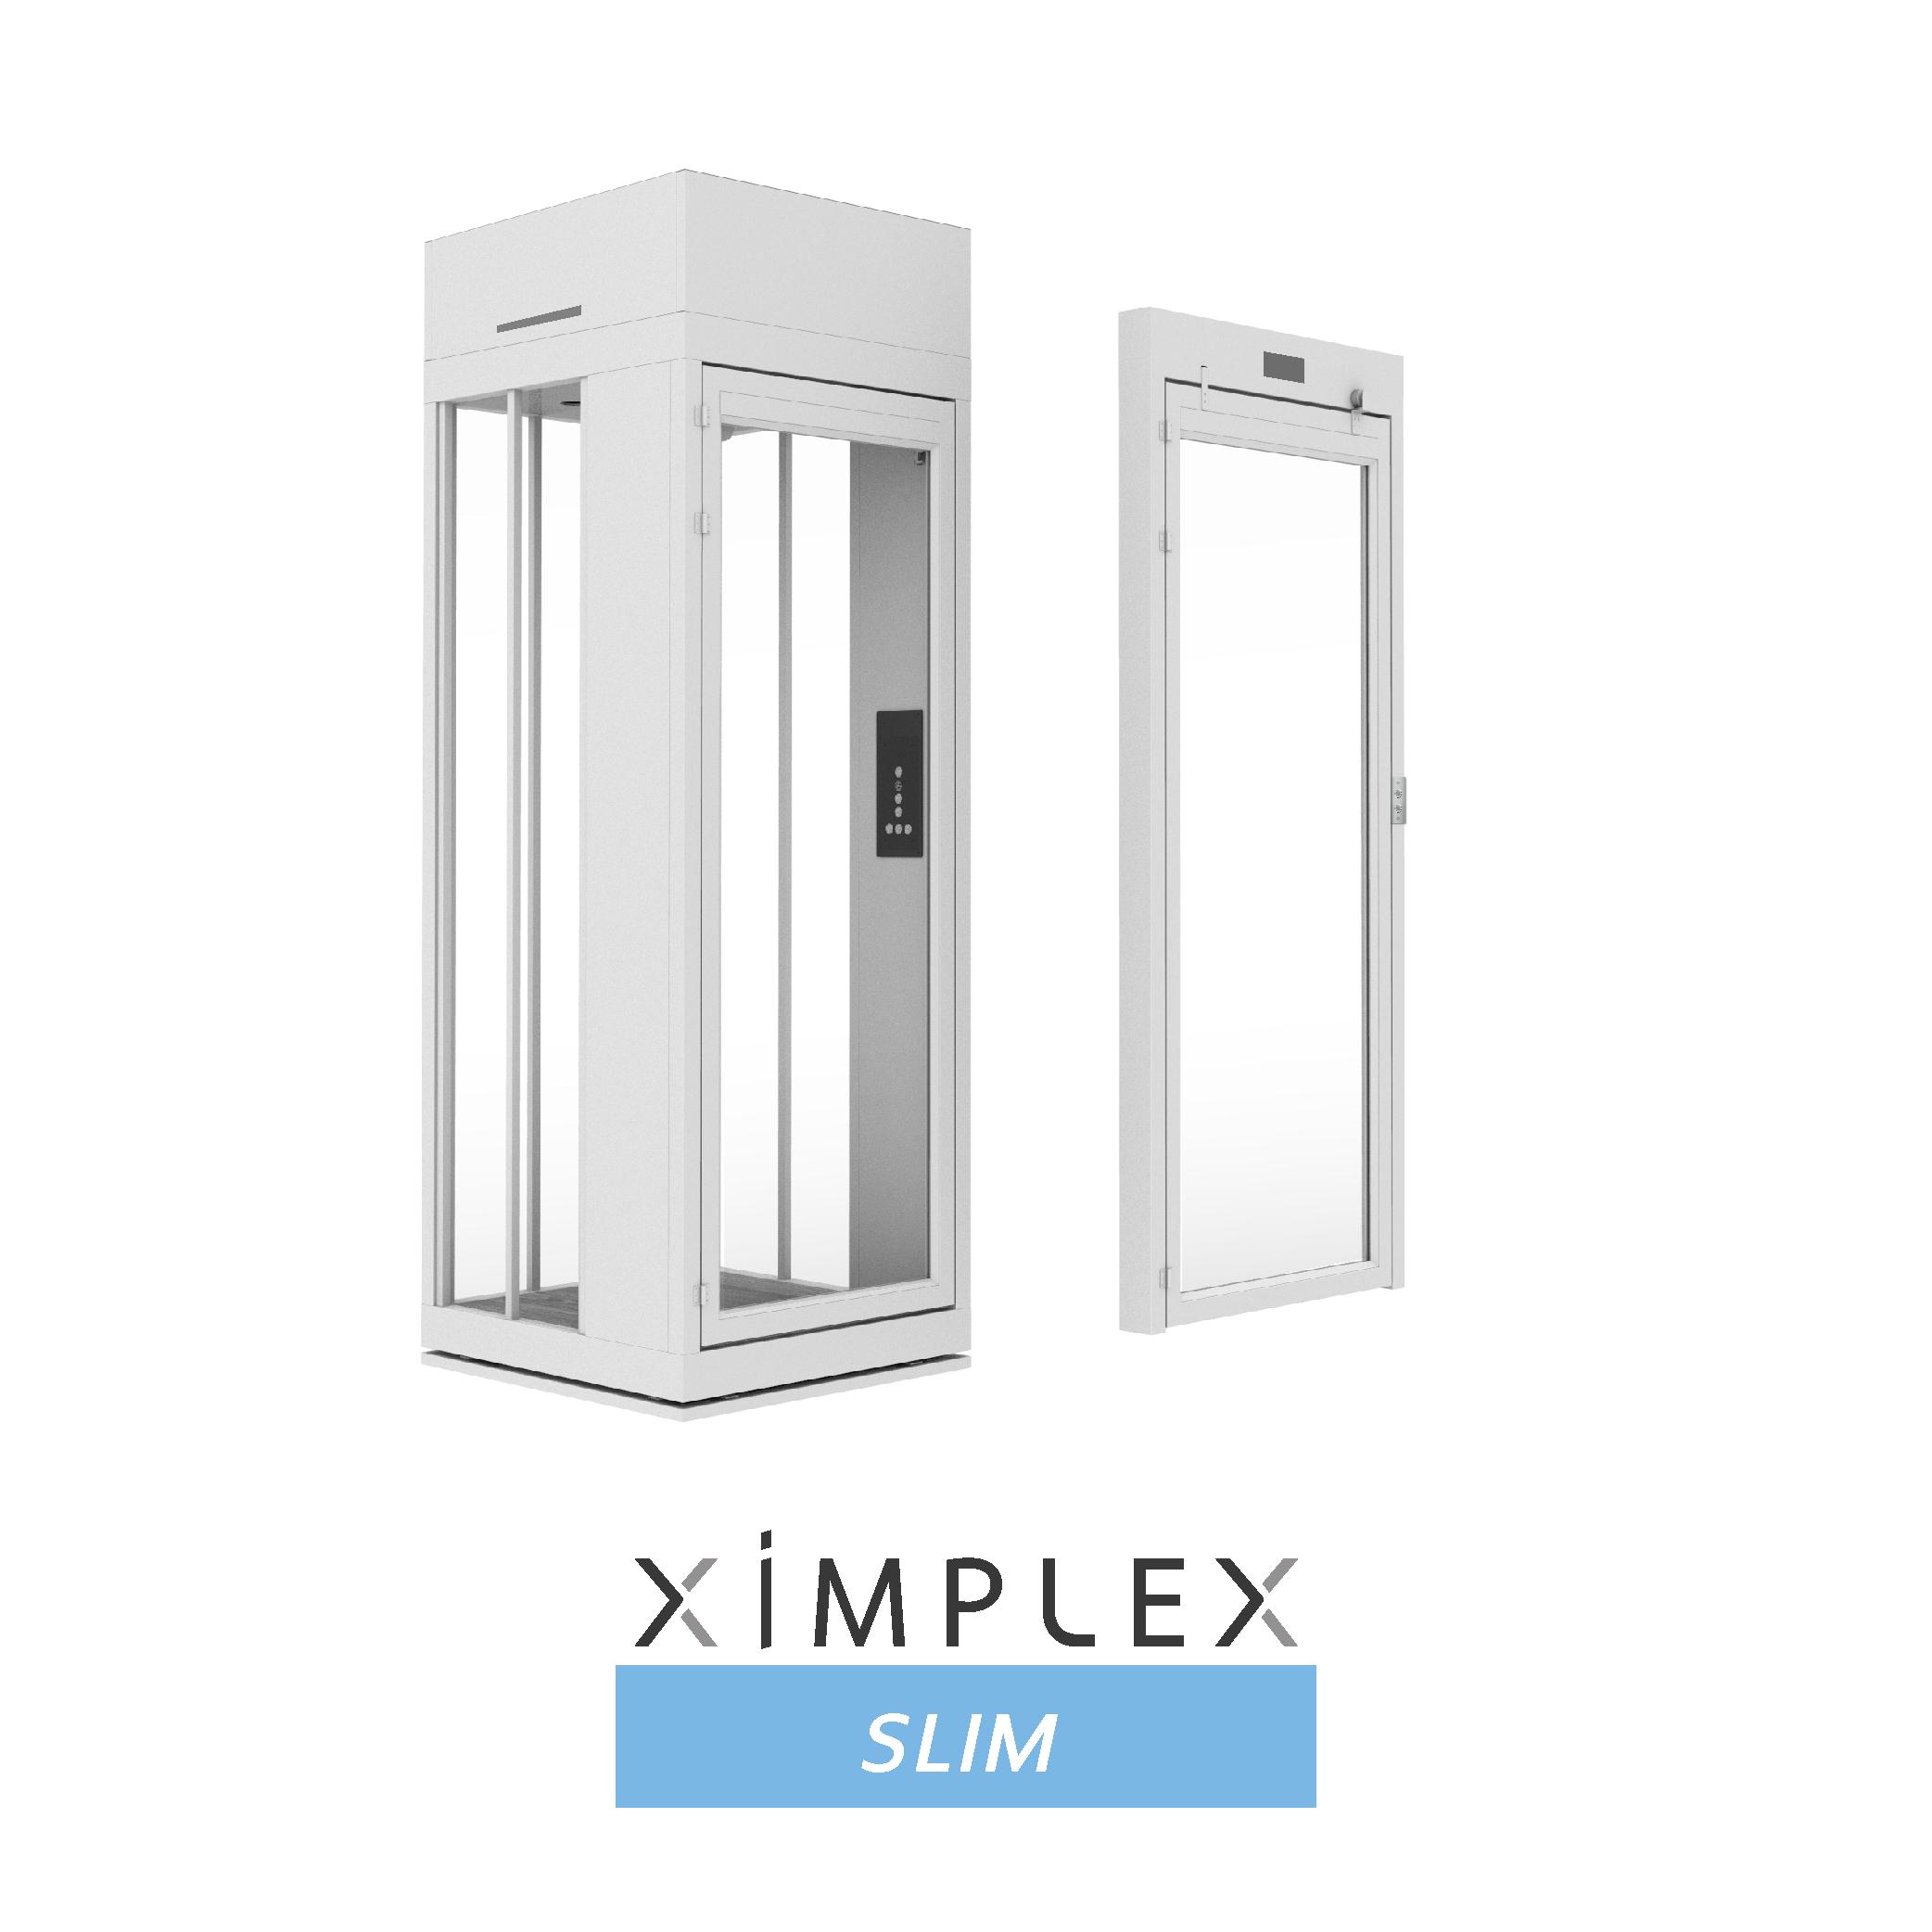 Ximplex Slim ลิฟต์บ้าน